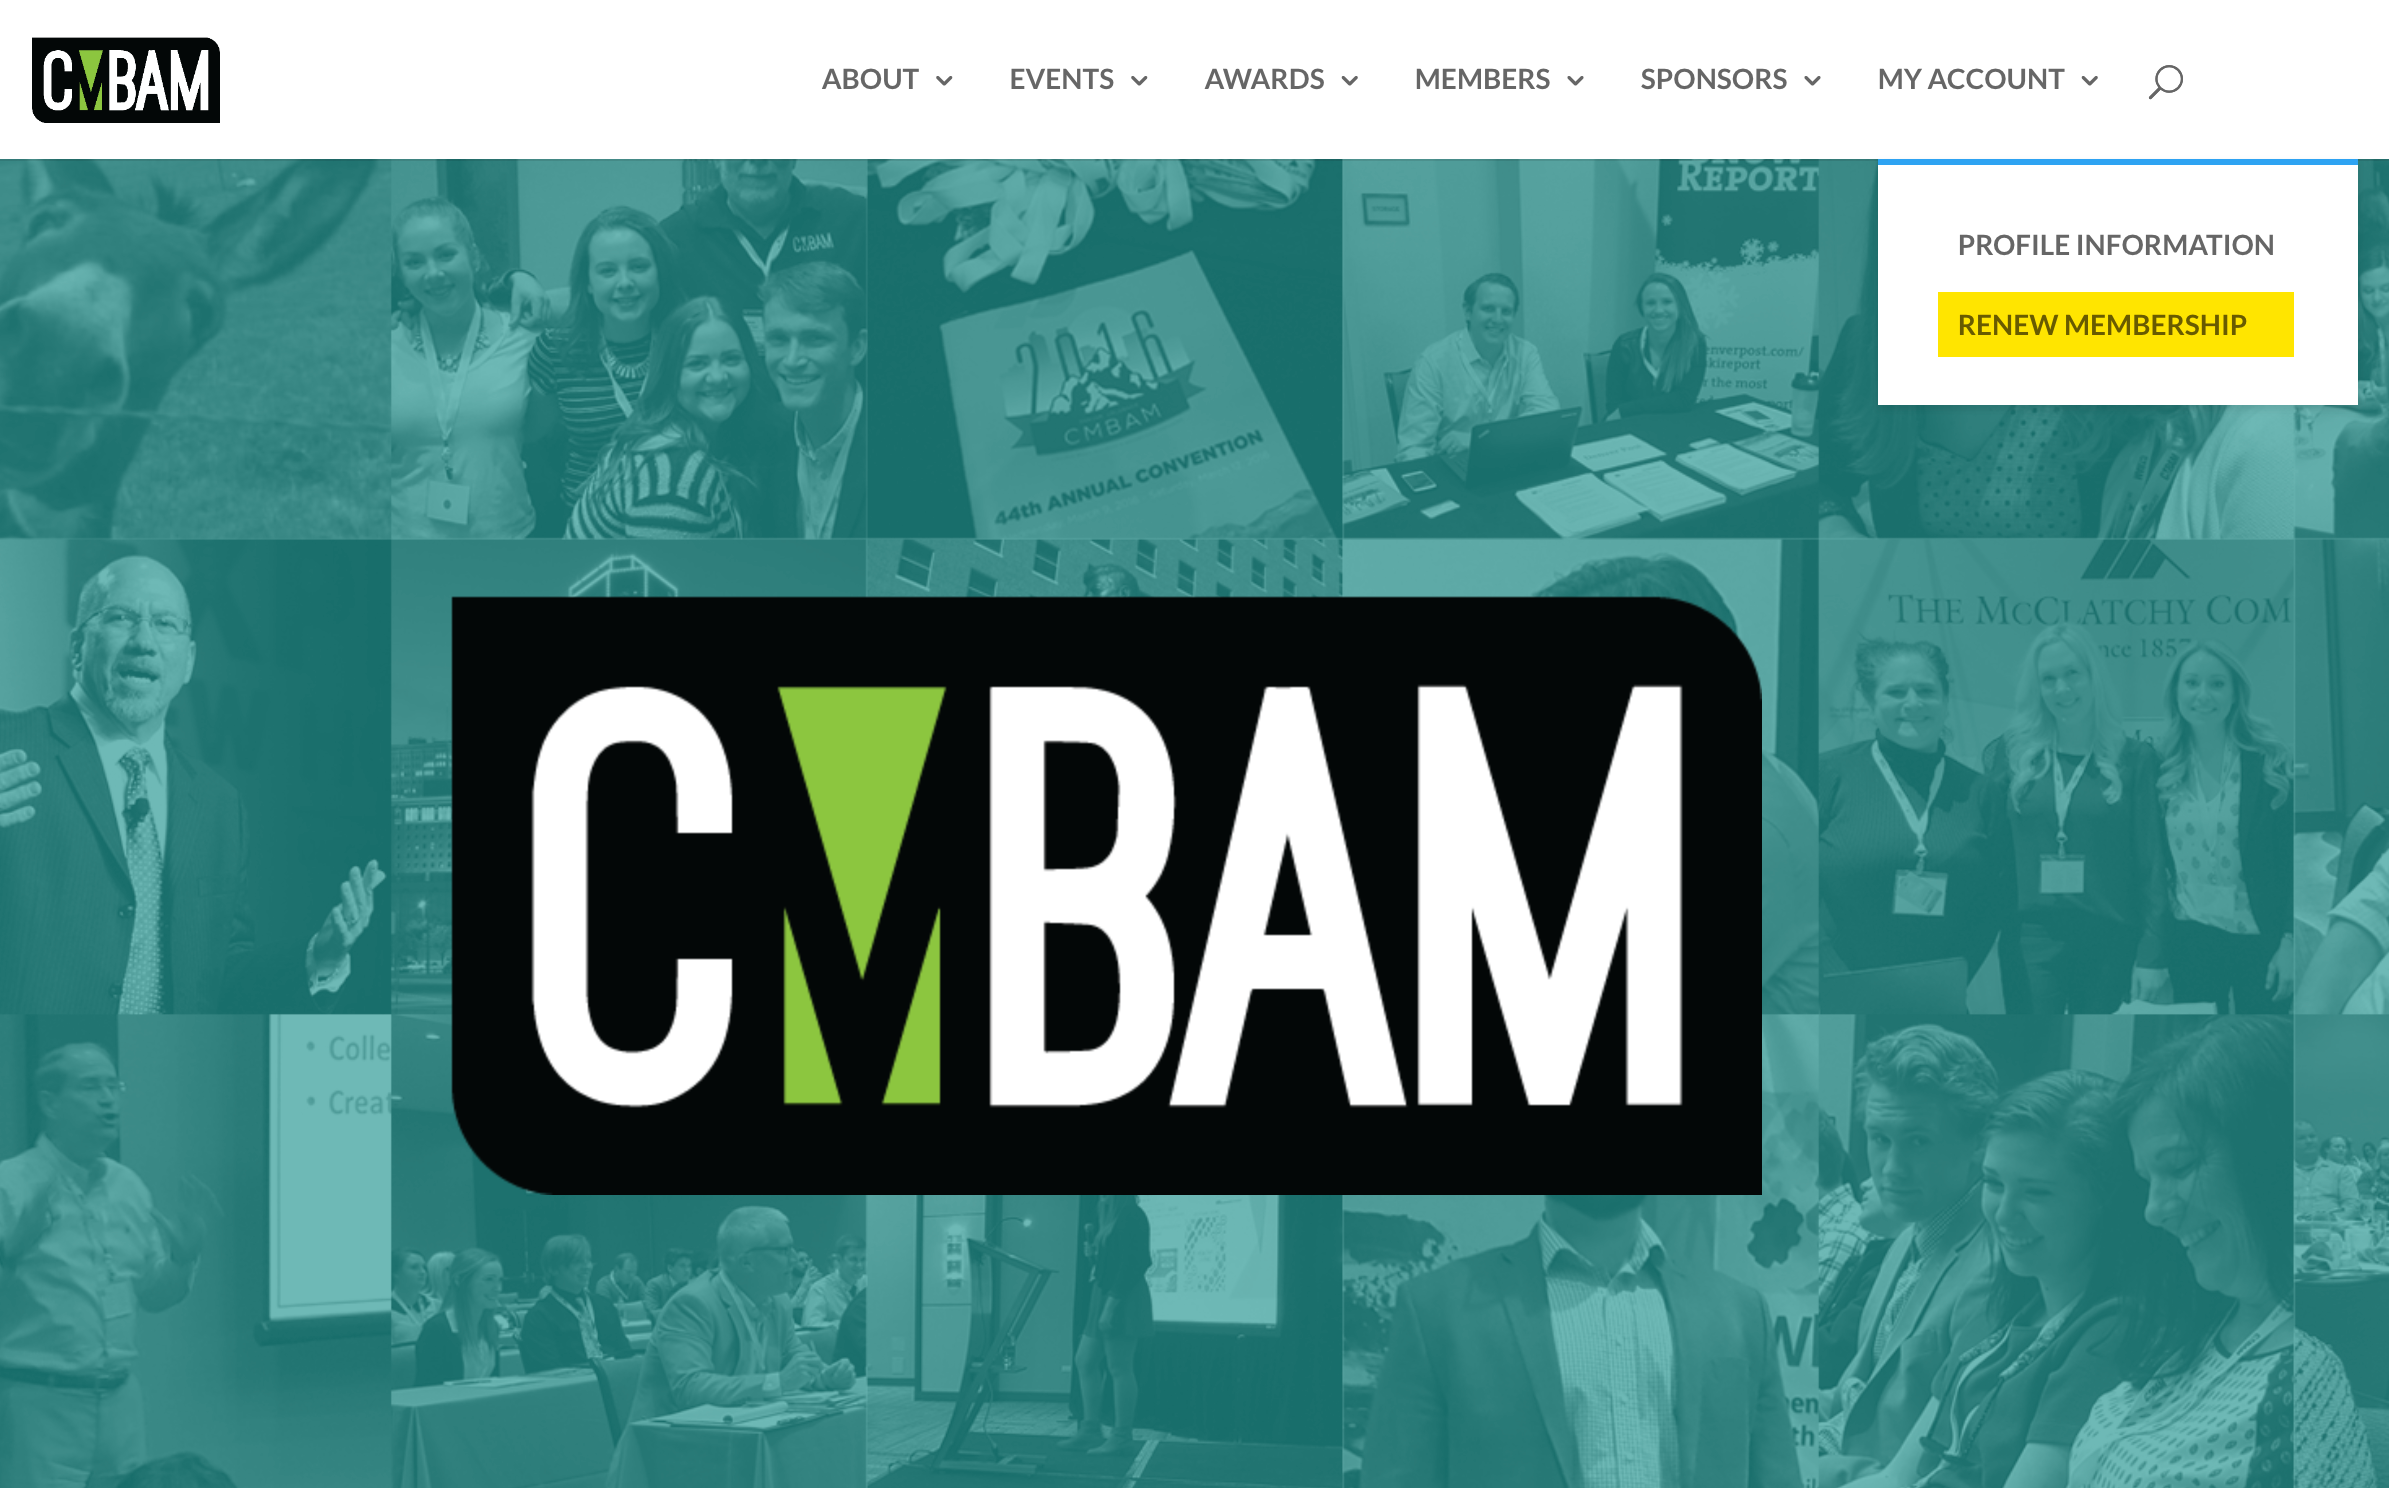 CMBAM Membership Renewals: A Walk-Through Guide | CMBAM